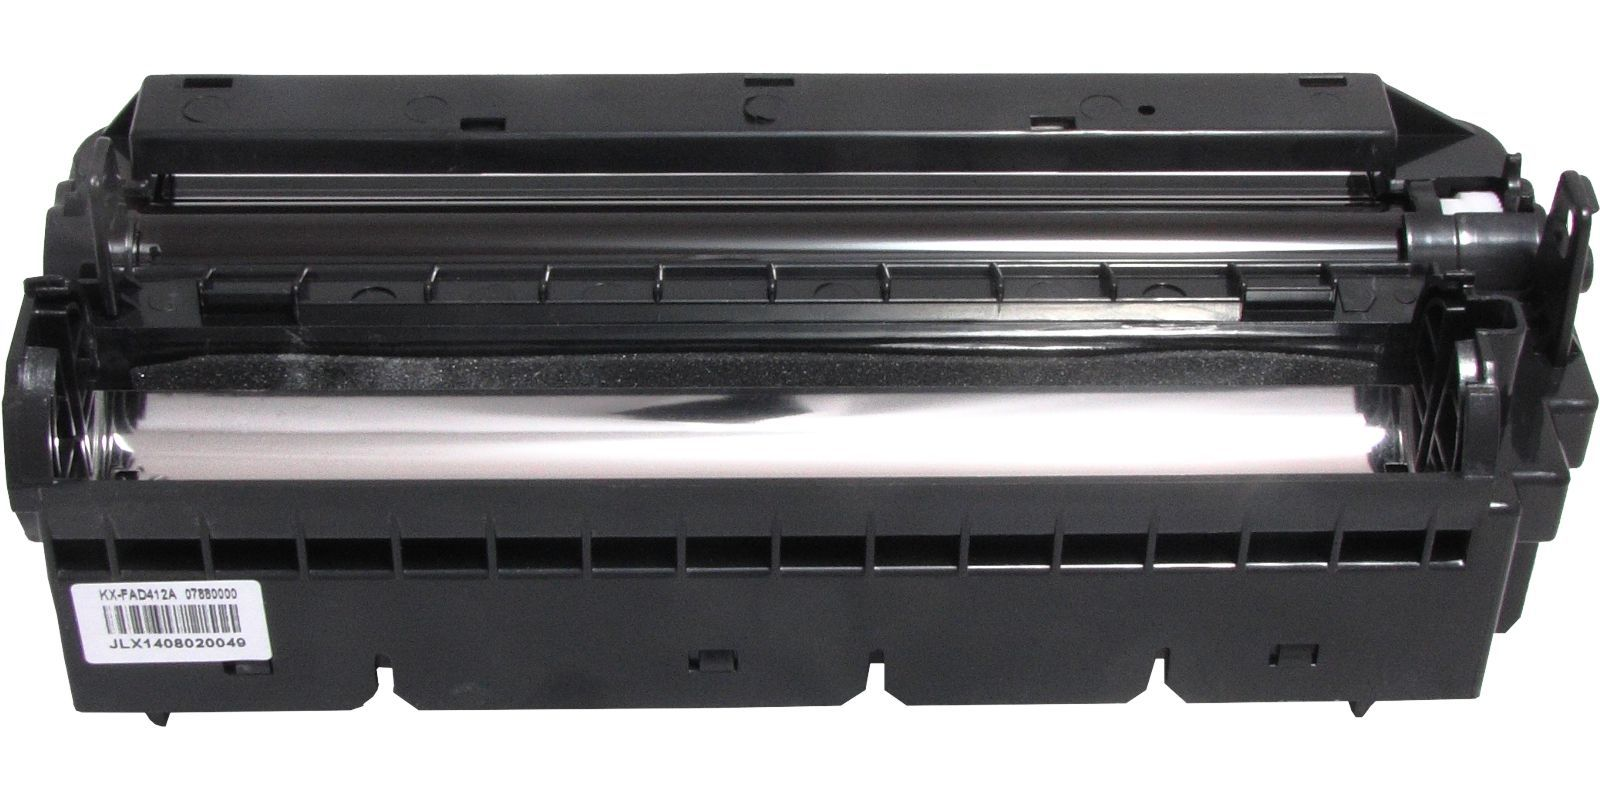 MAK KX-FAD412A черный, для Panasonic, до 6000 стр.